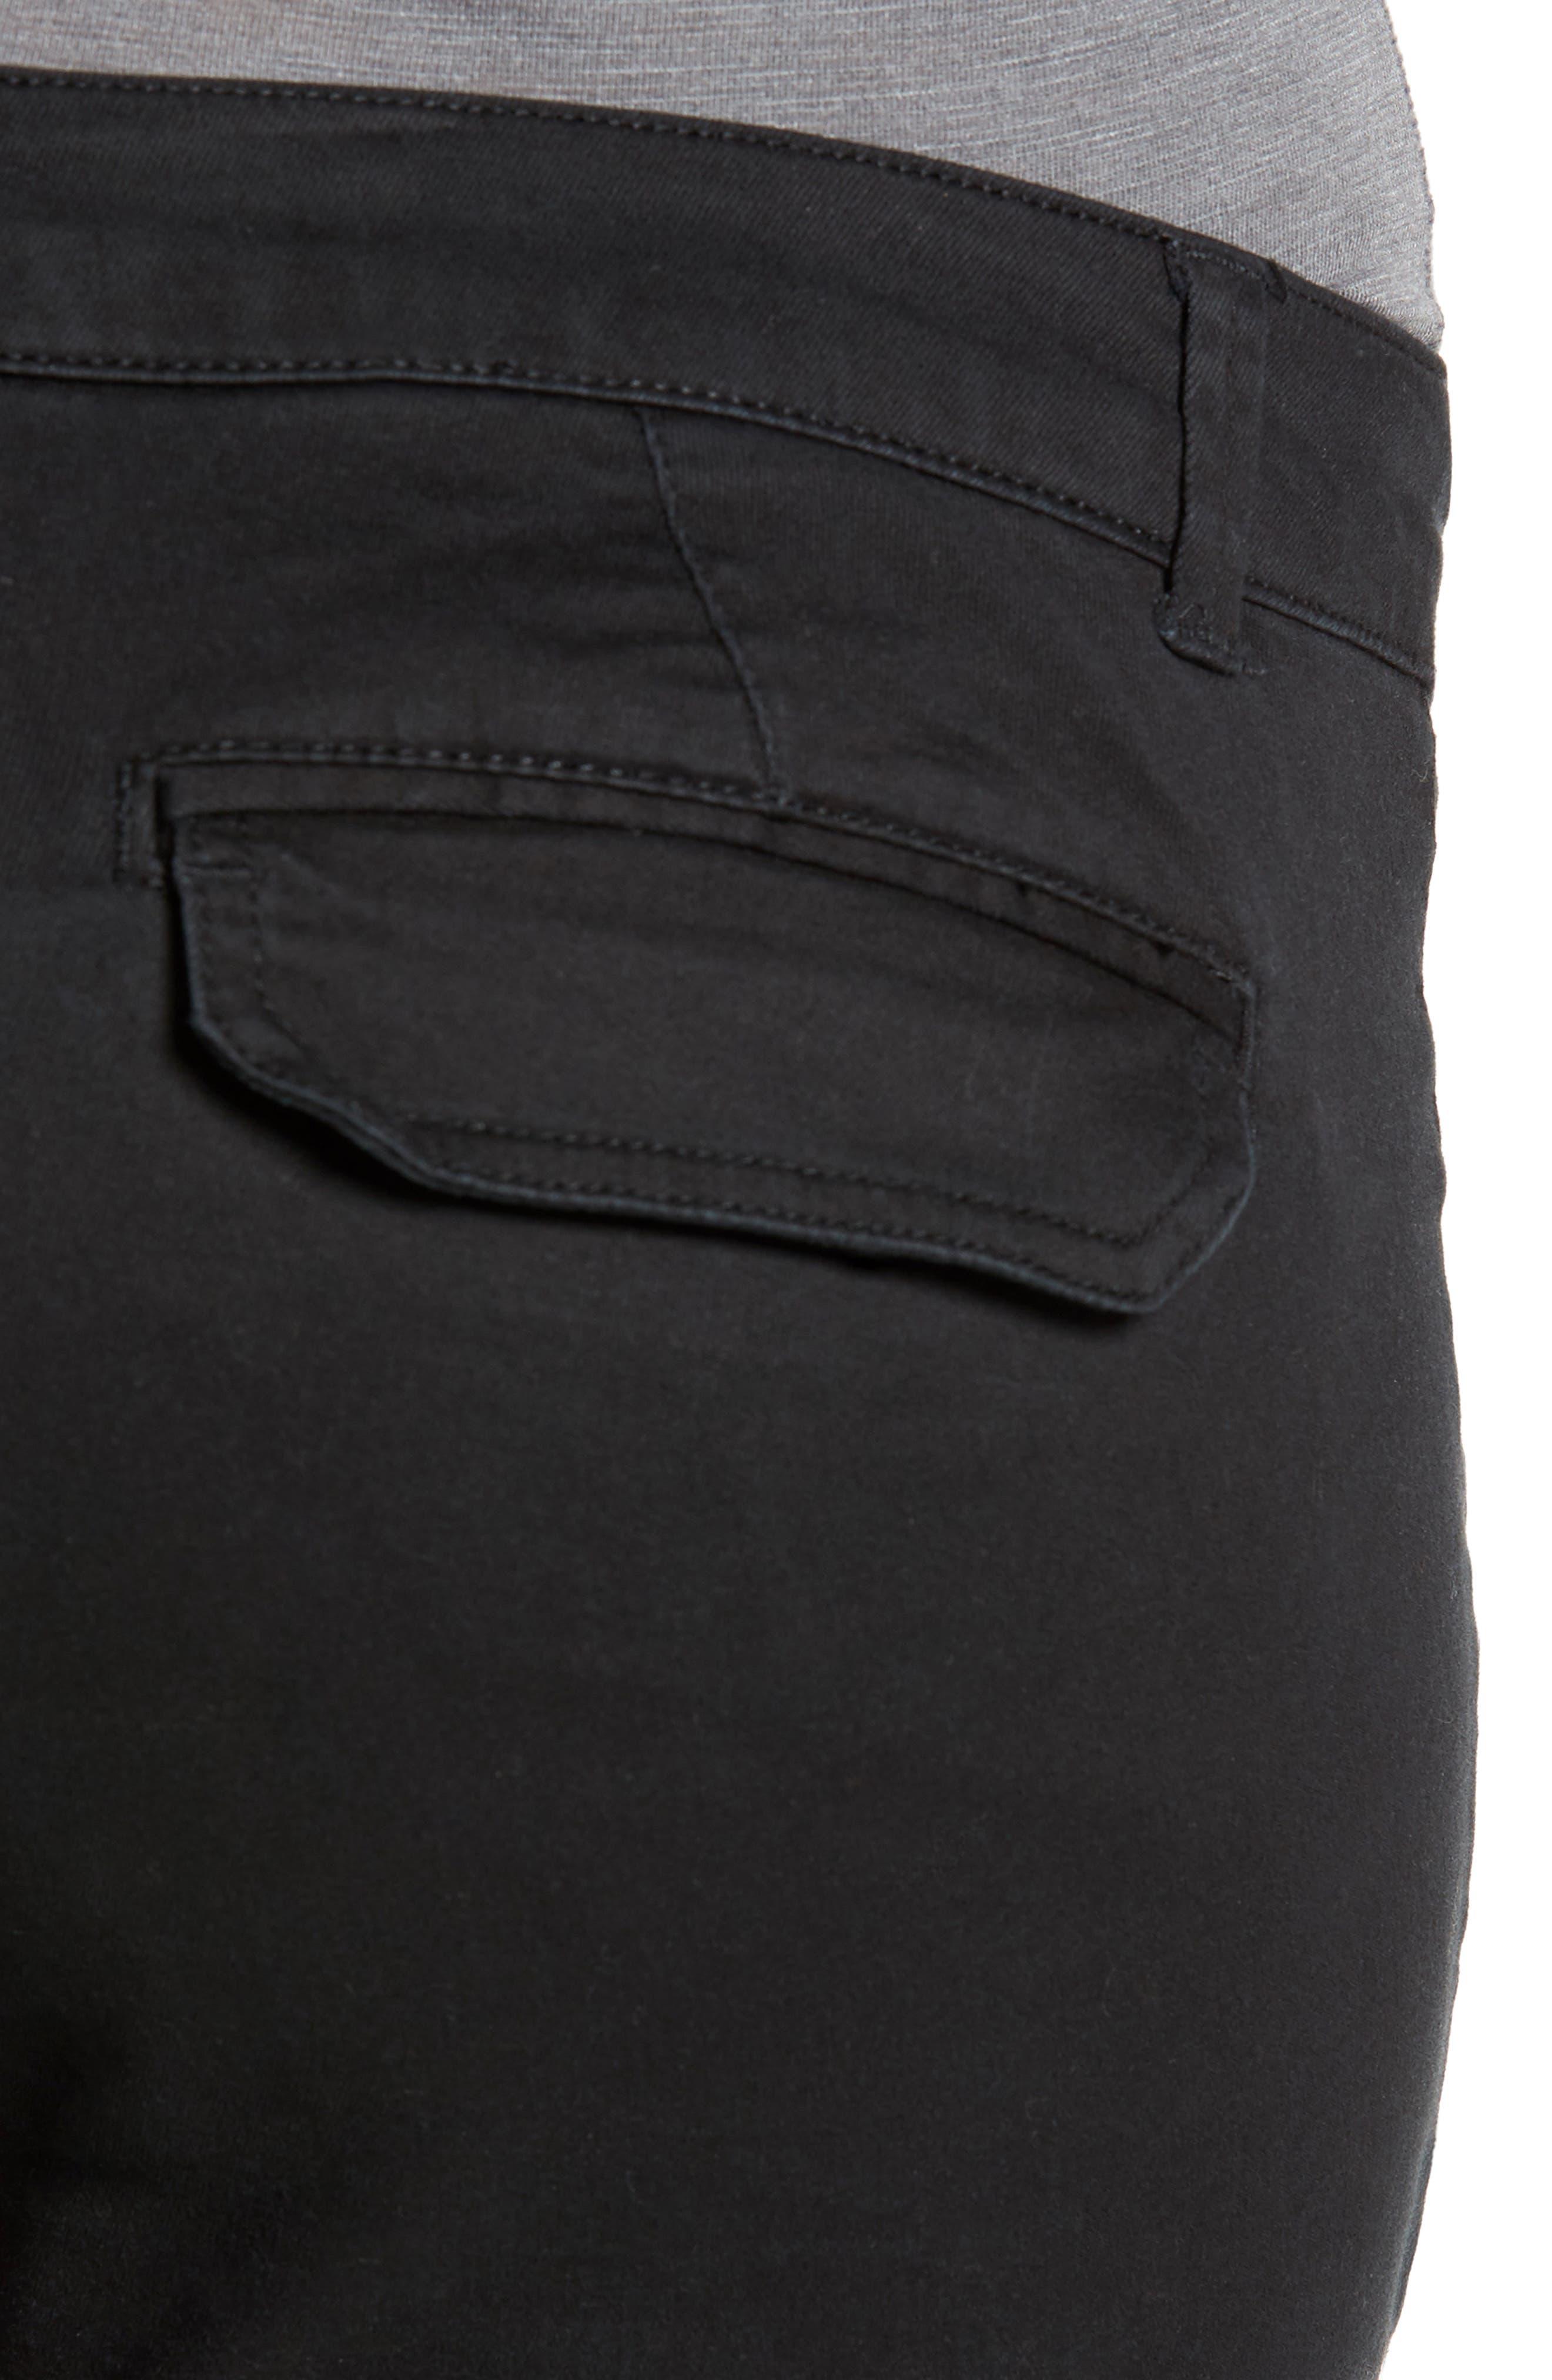 Skinny Cargo Pants,                             Alternate thumbnail 44, color,